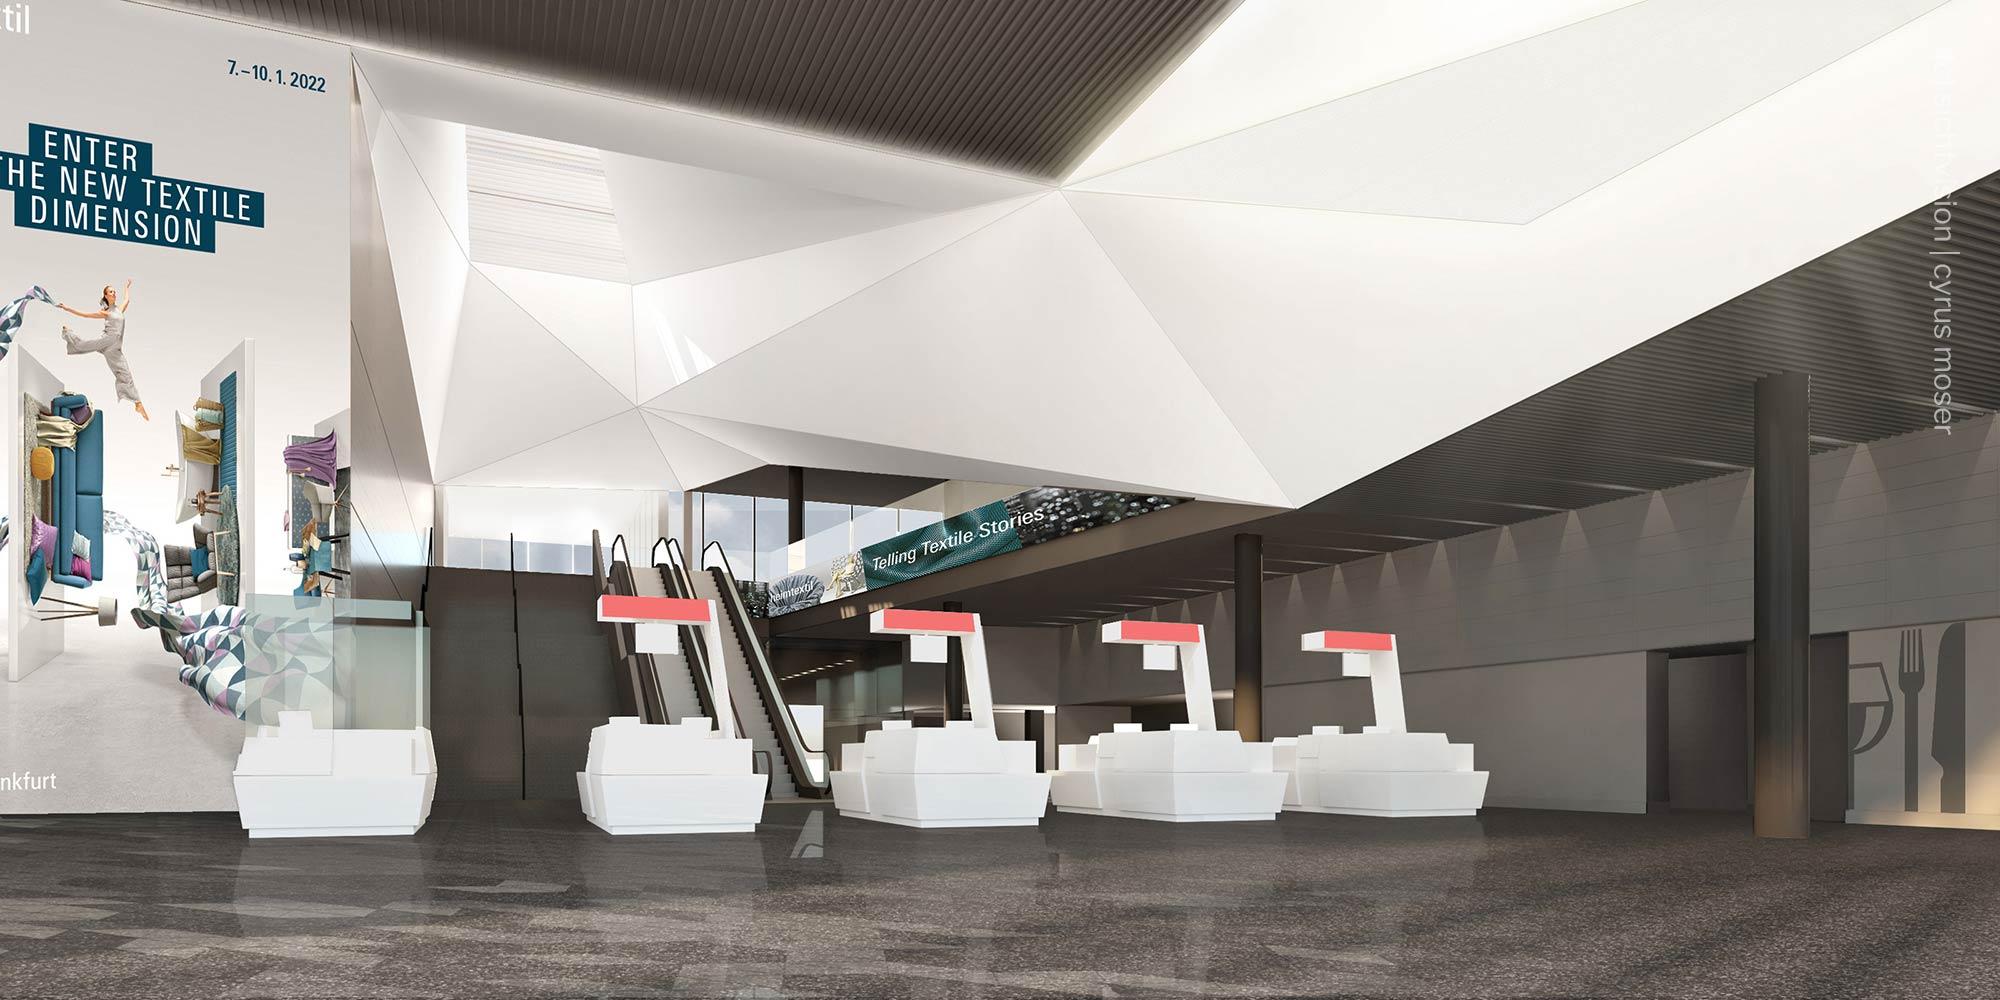 Heimtextil Frankfurt - Messe Frankfurt neuer Eingang - Computer Animation Sparda Tower Frankfurt